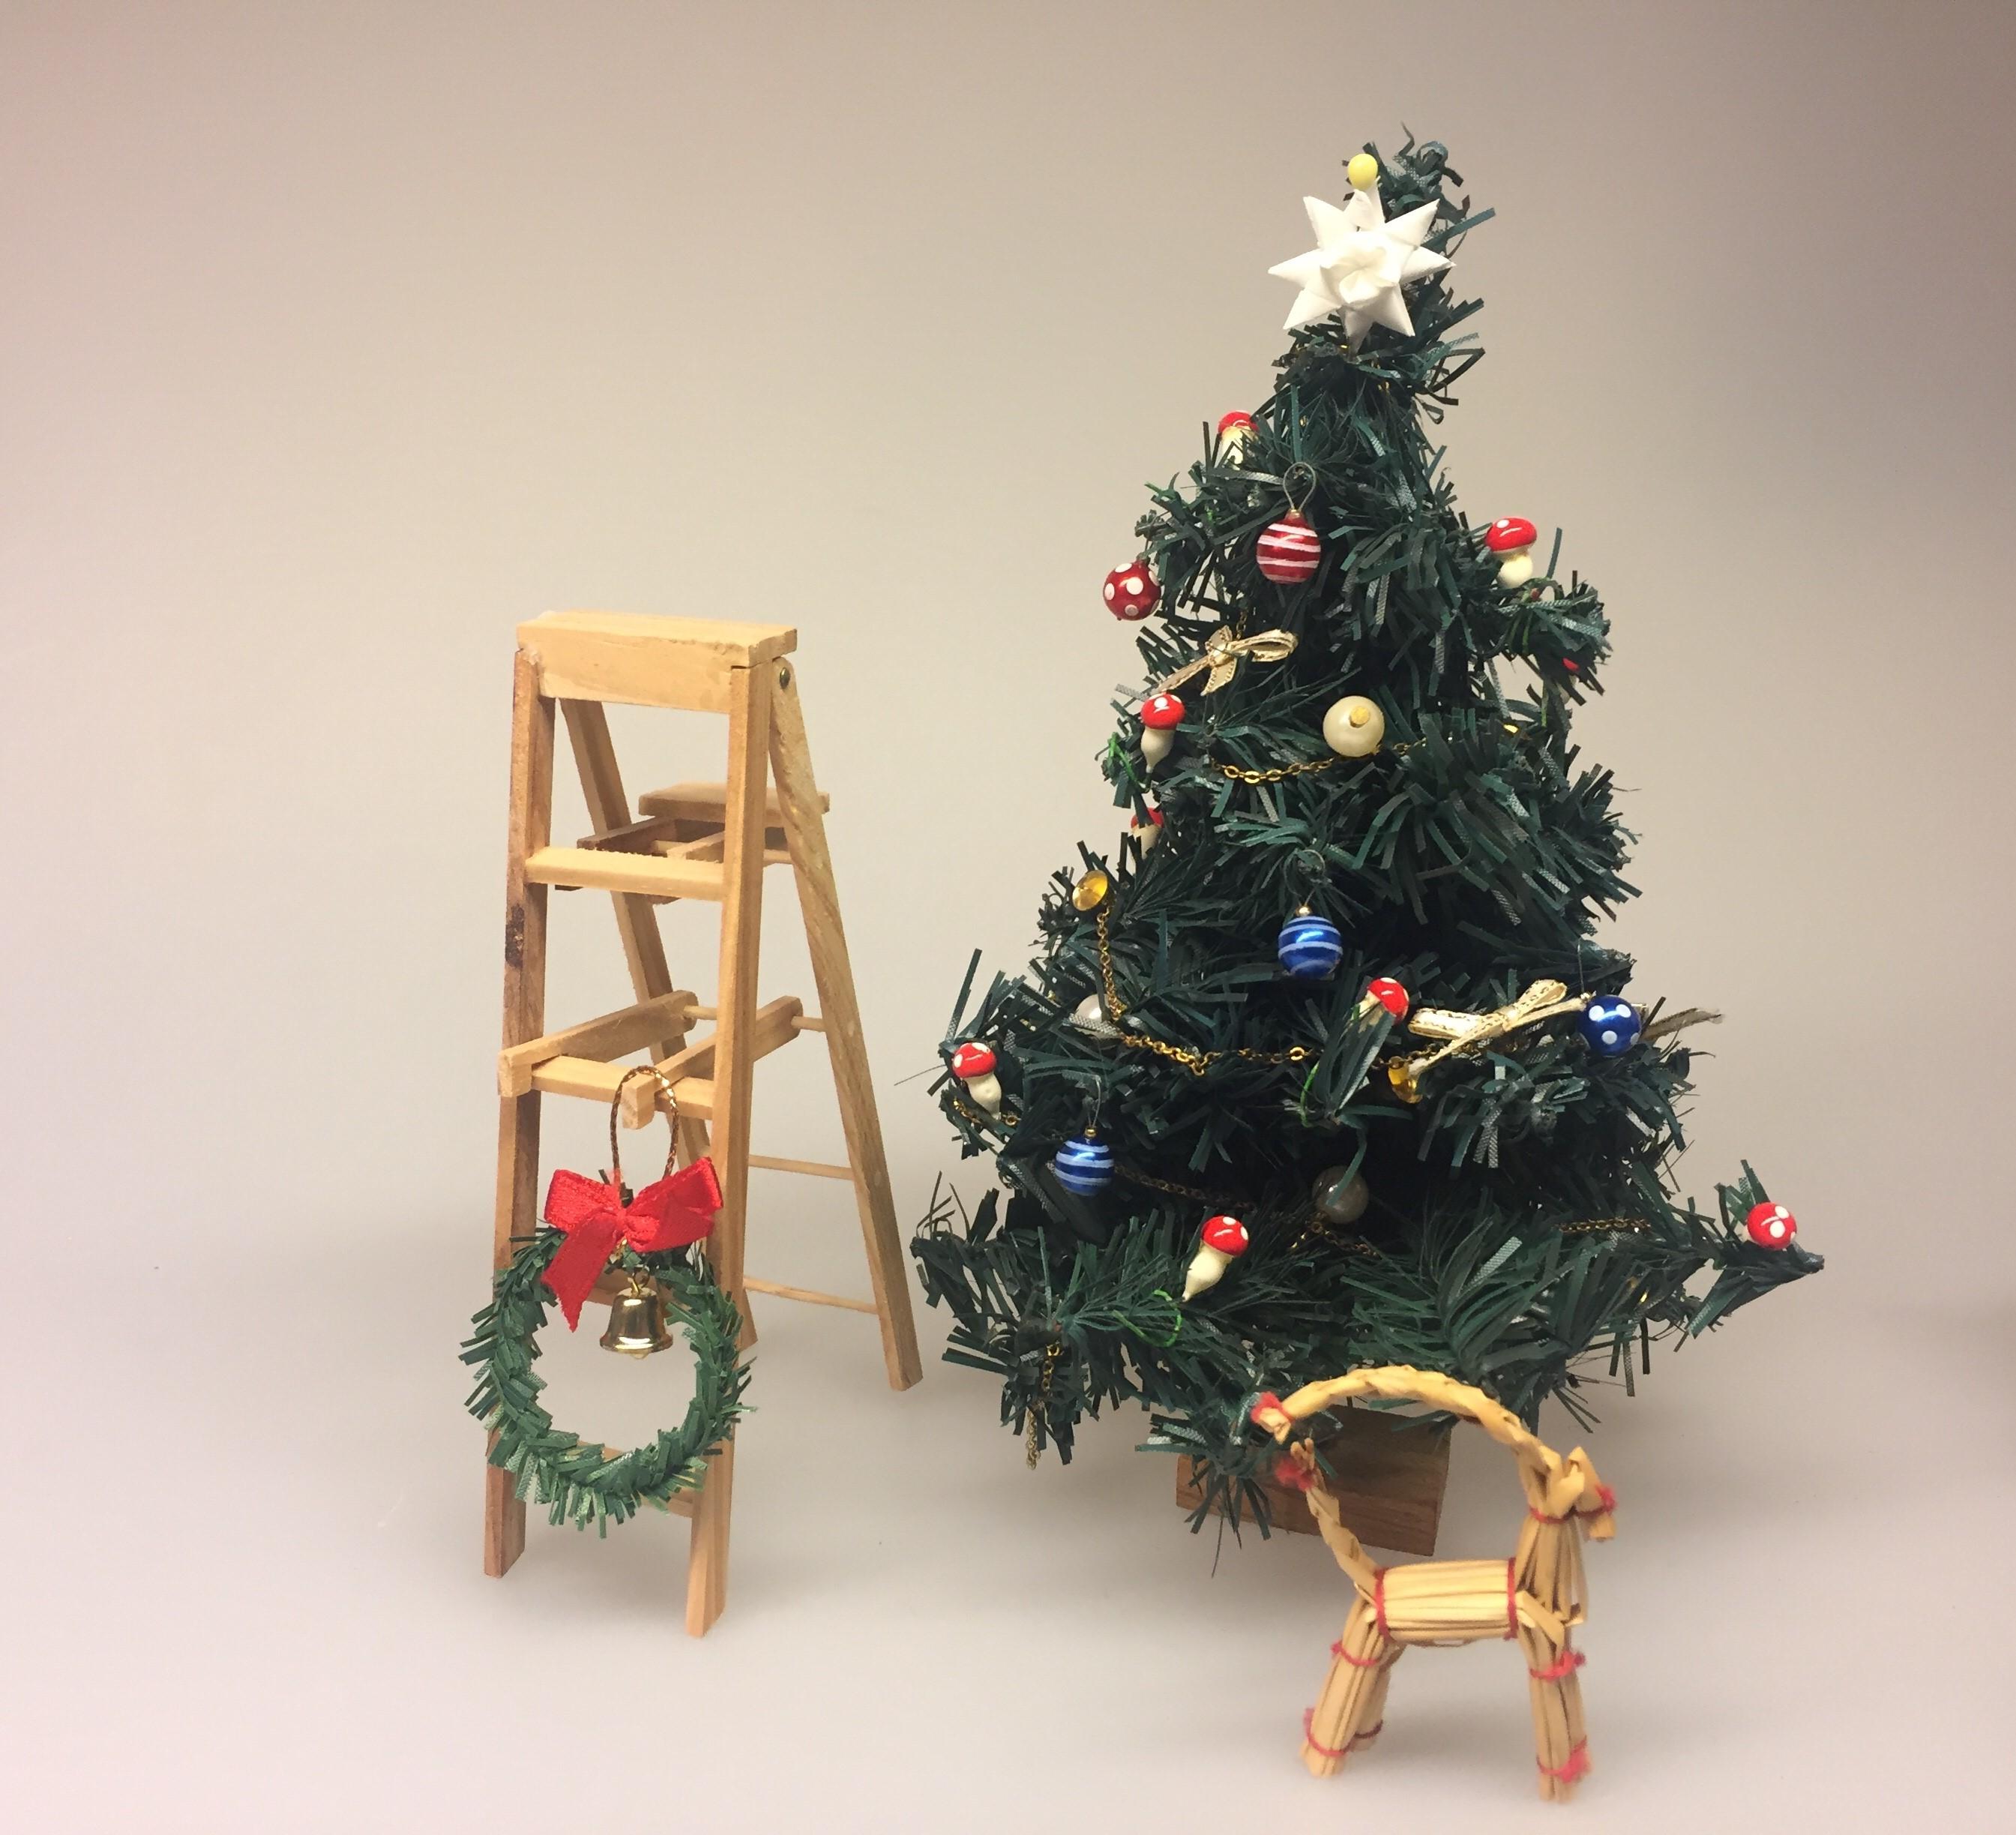 Miniature julepynt - Flettede små stjerner hvide,Miniature stige foldbar, wienerstige, stige, træstige, dukkehus, dukkehusting, ting til dukkehuset, miniature, miniaturer, nissedør, nisse, nisserne, nissehus, nisse tilbehør, dukkehus tilbehør, biti, ribe